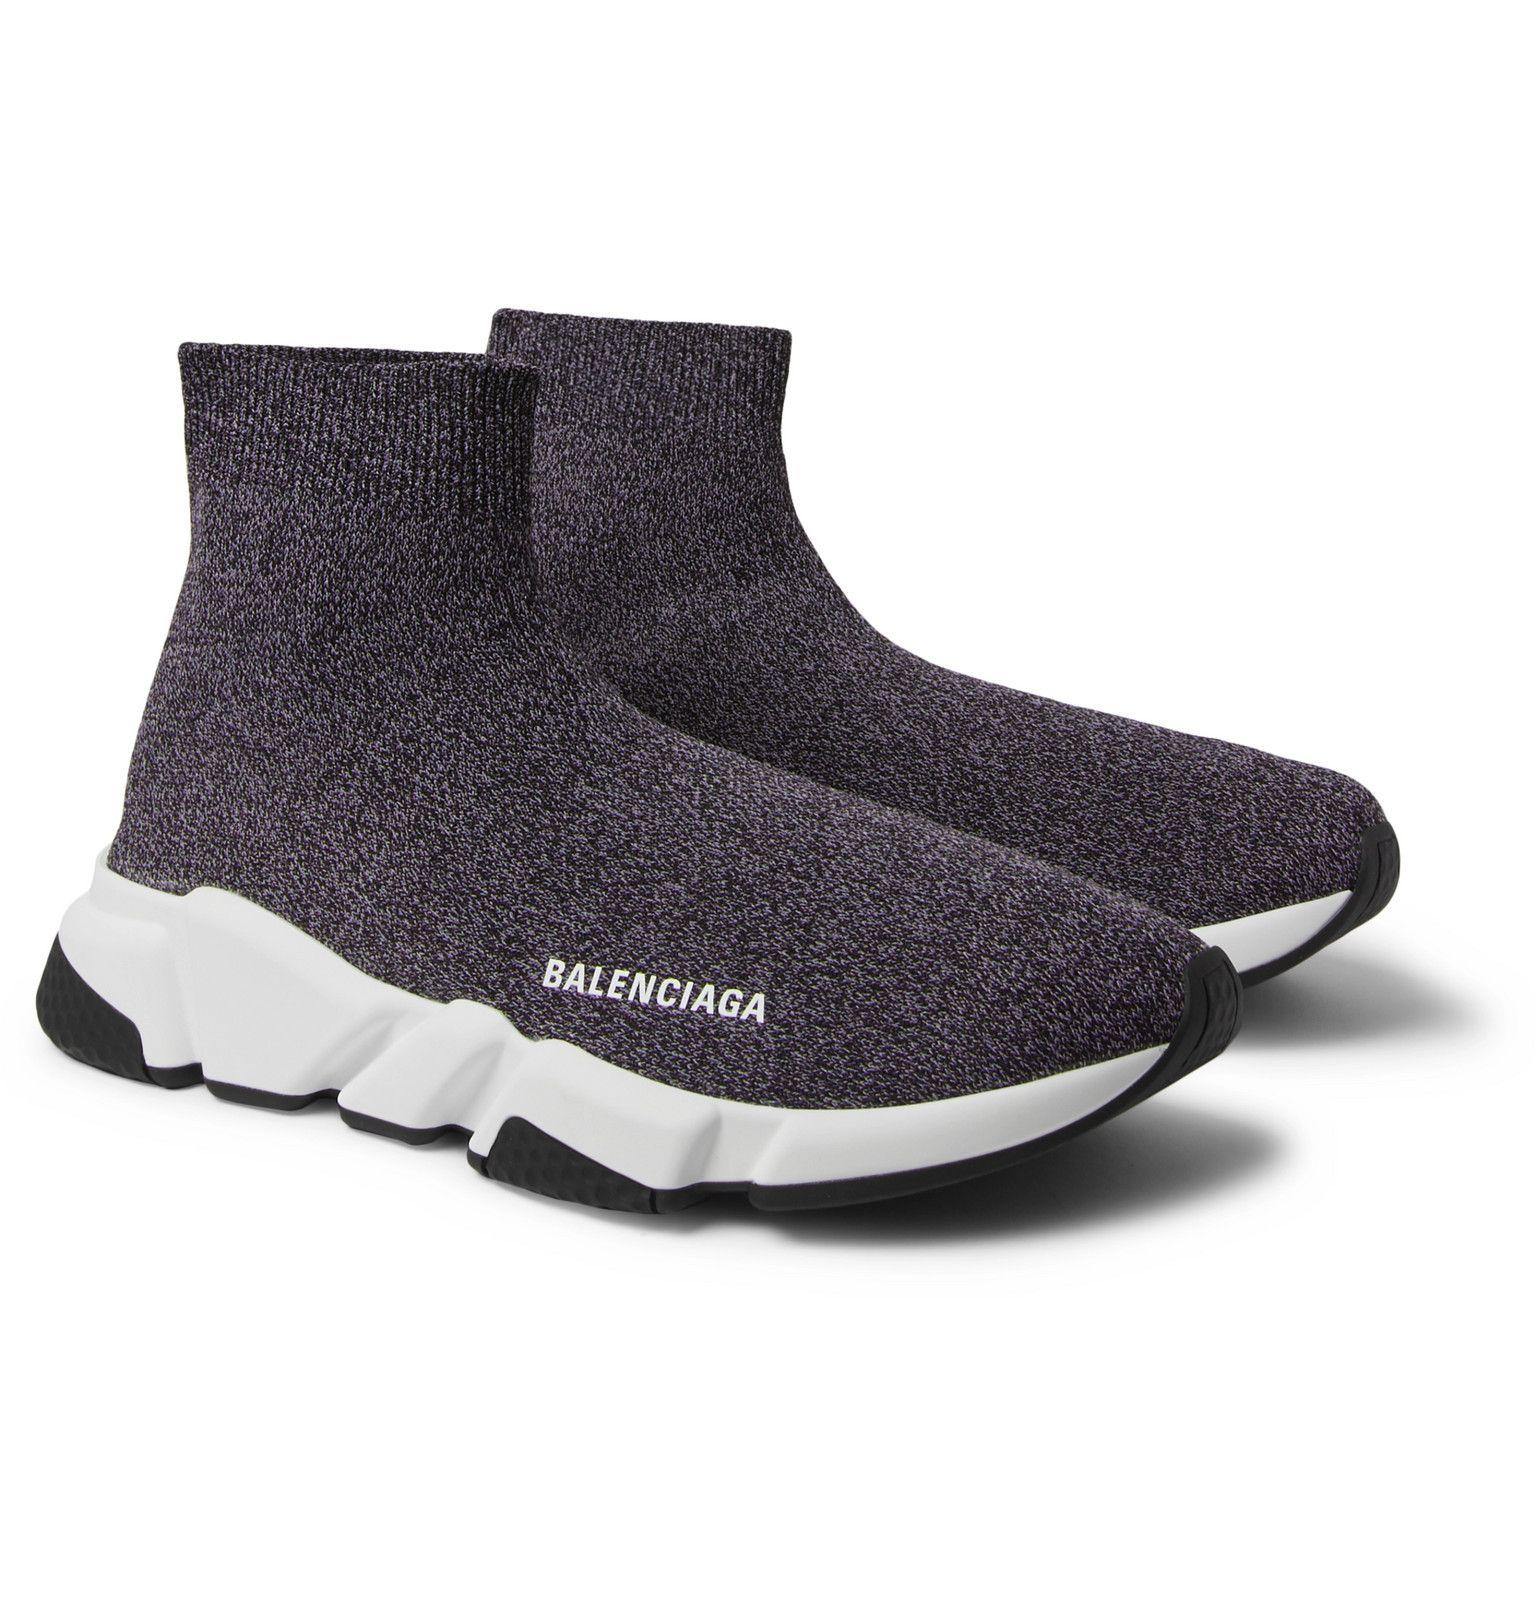 Pin on balenciagas.socks edition